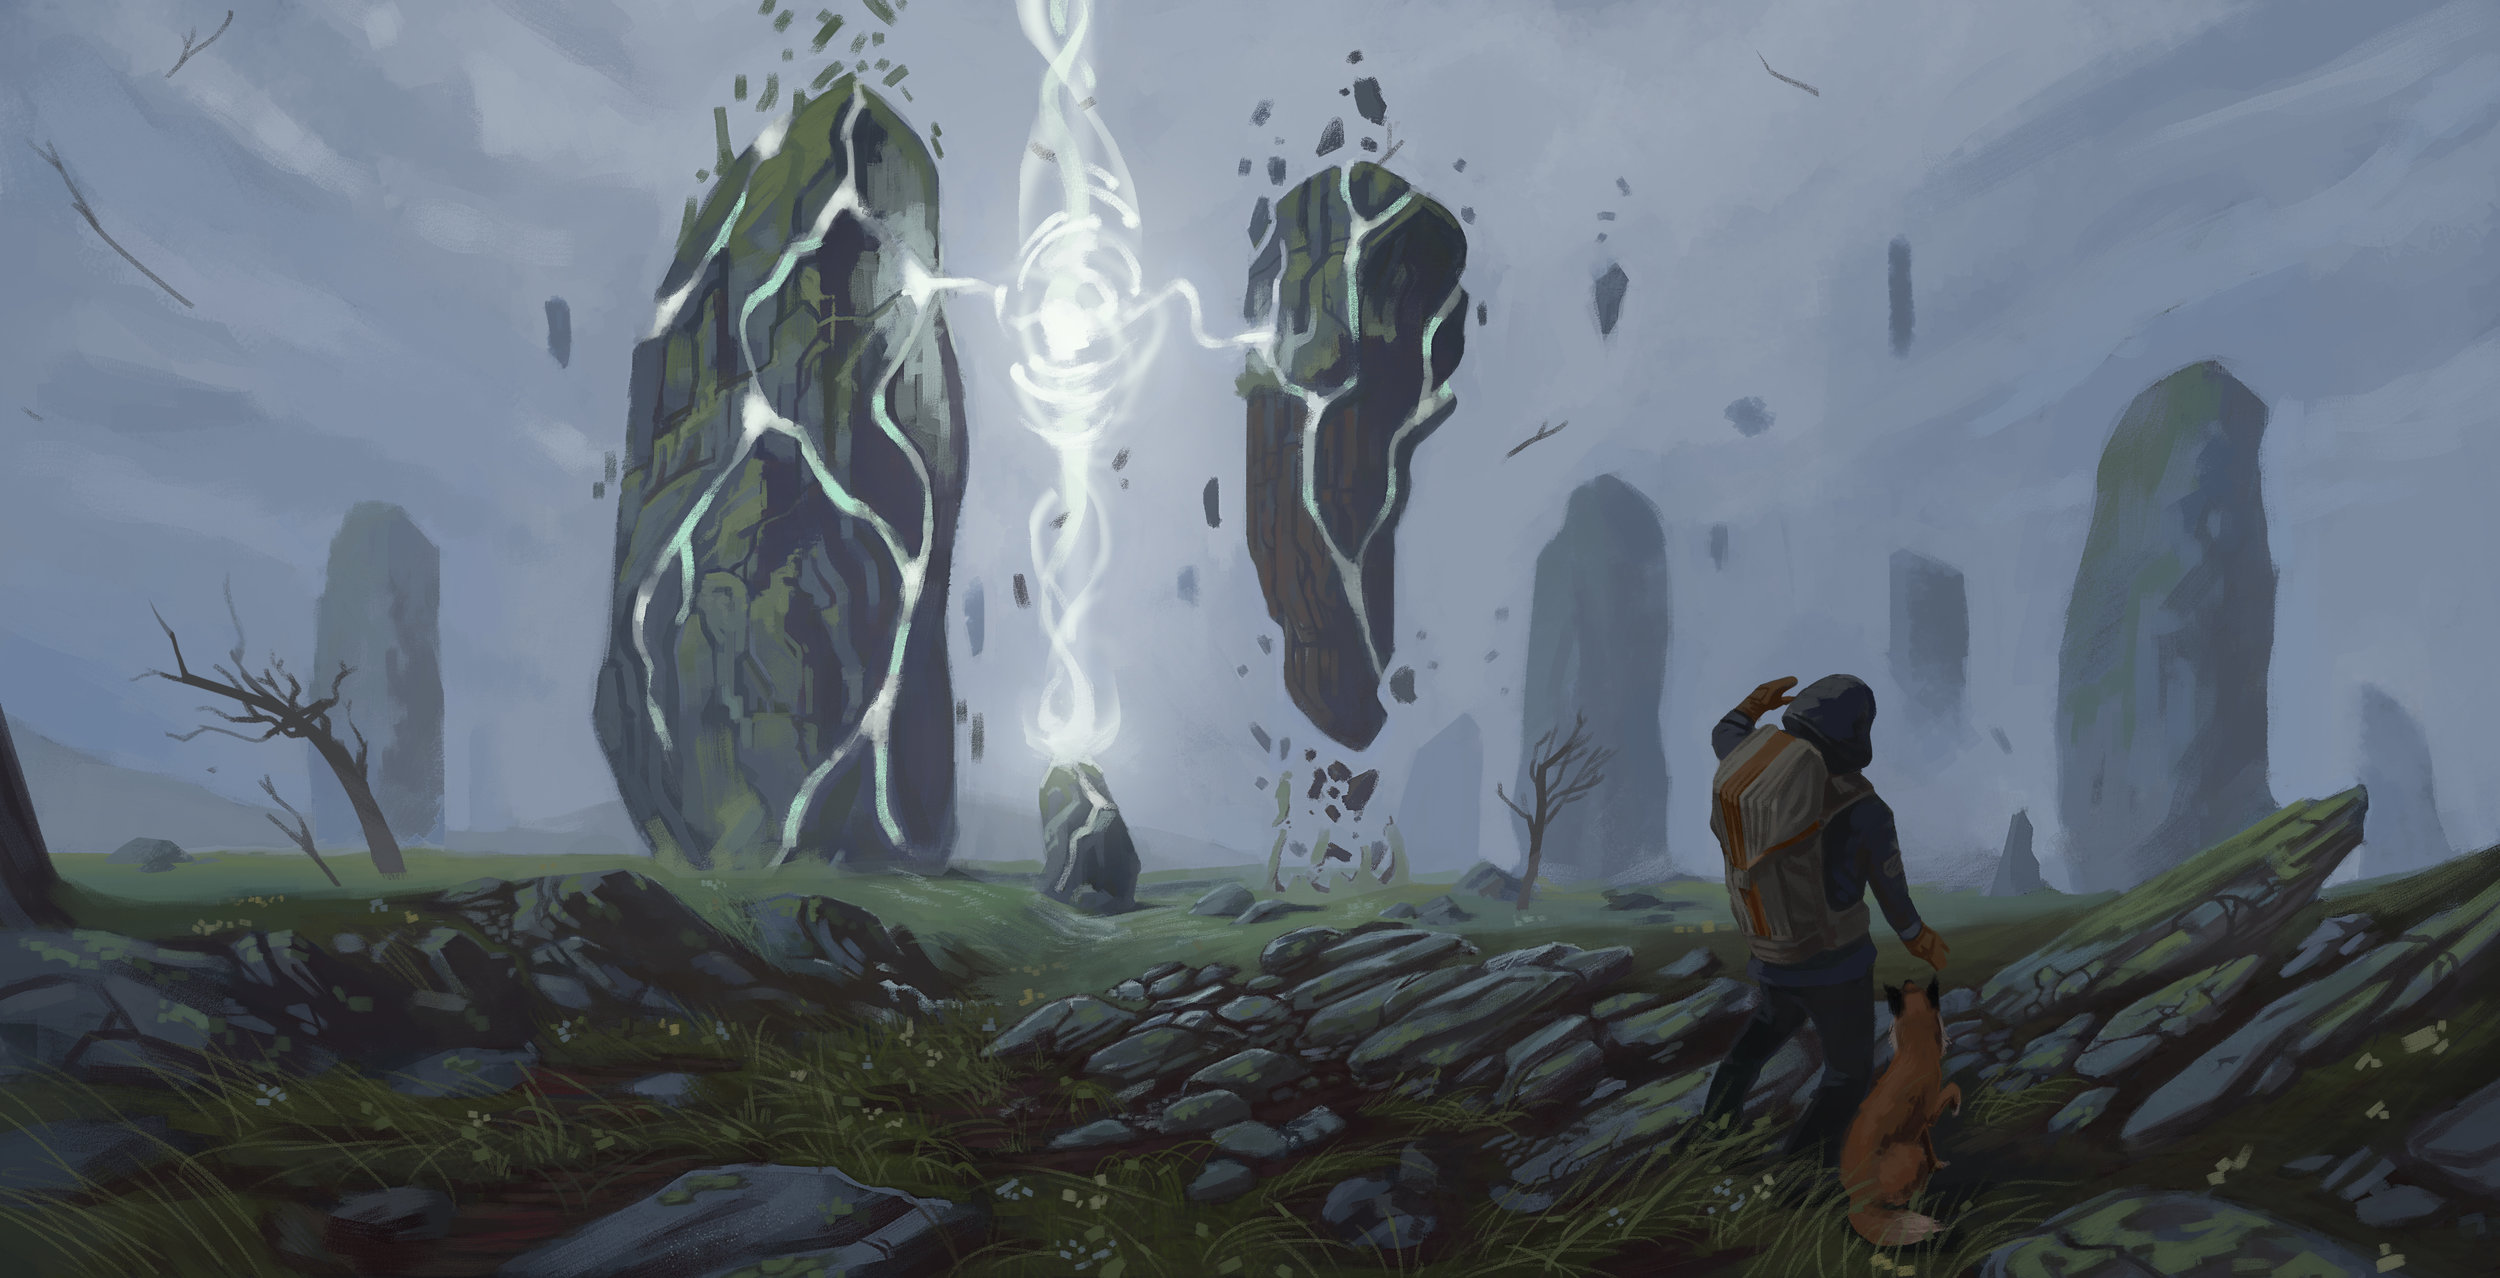 Megalithic site awakening.